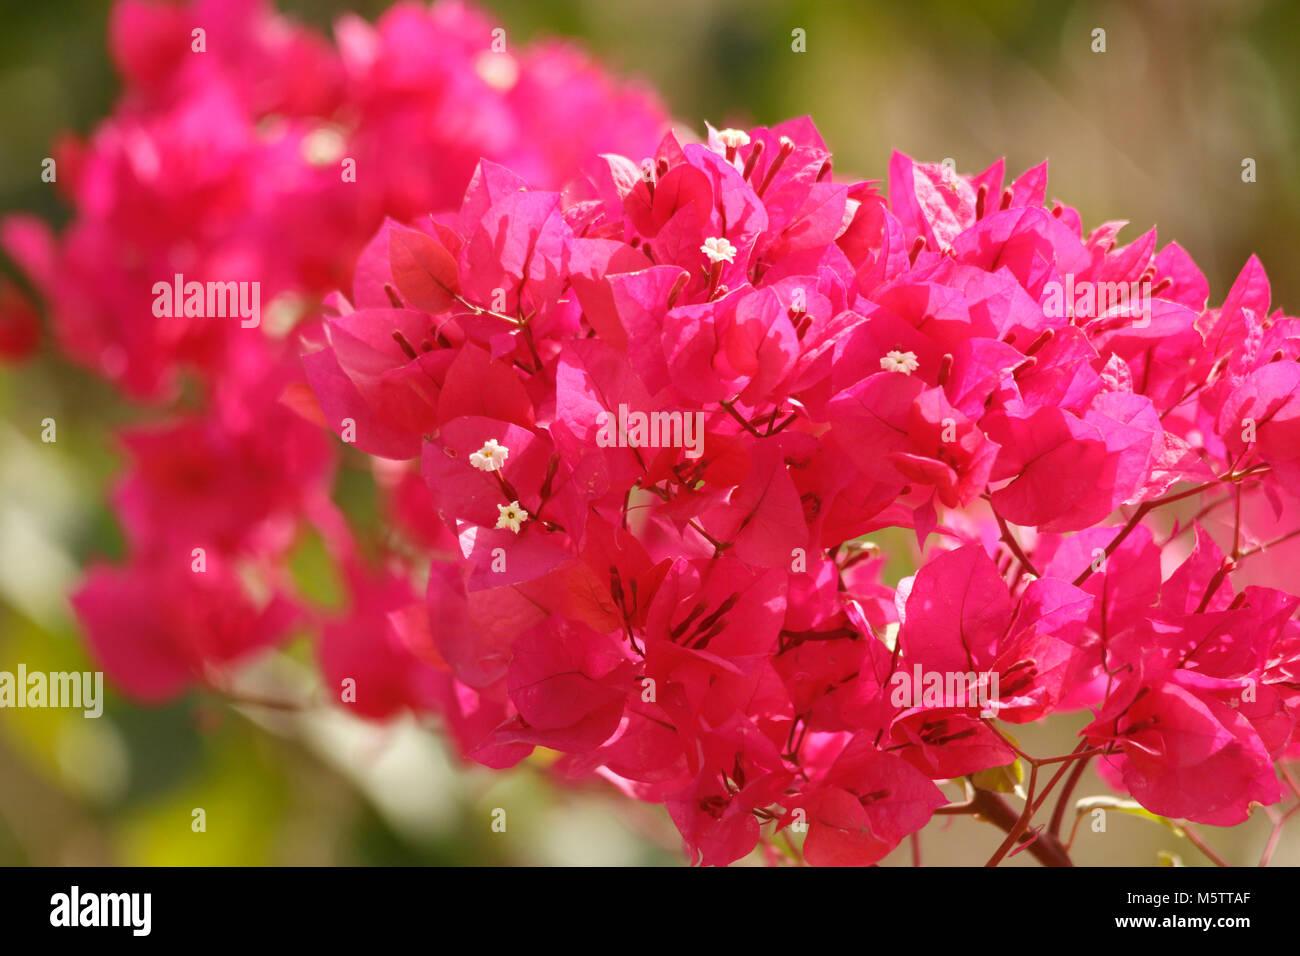 Bougainvillea flowers beautiful colors Stock Photo: 175722919 - Alamy